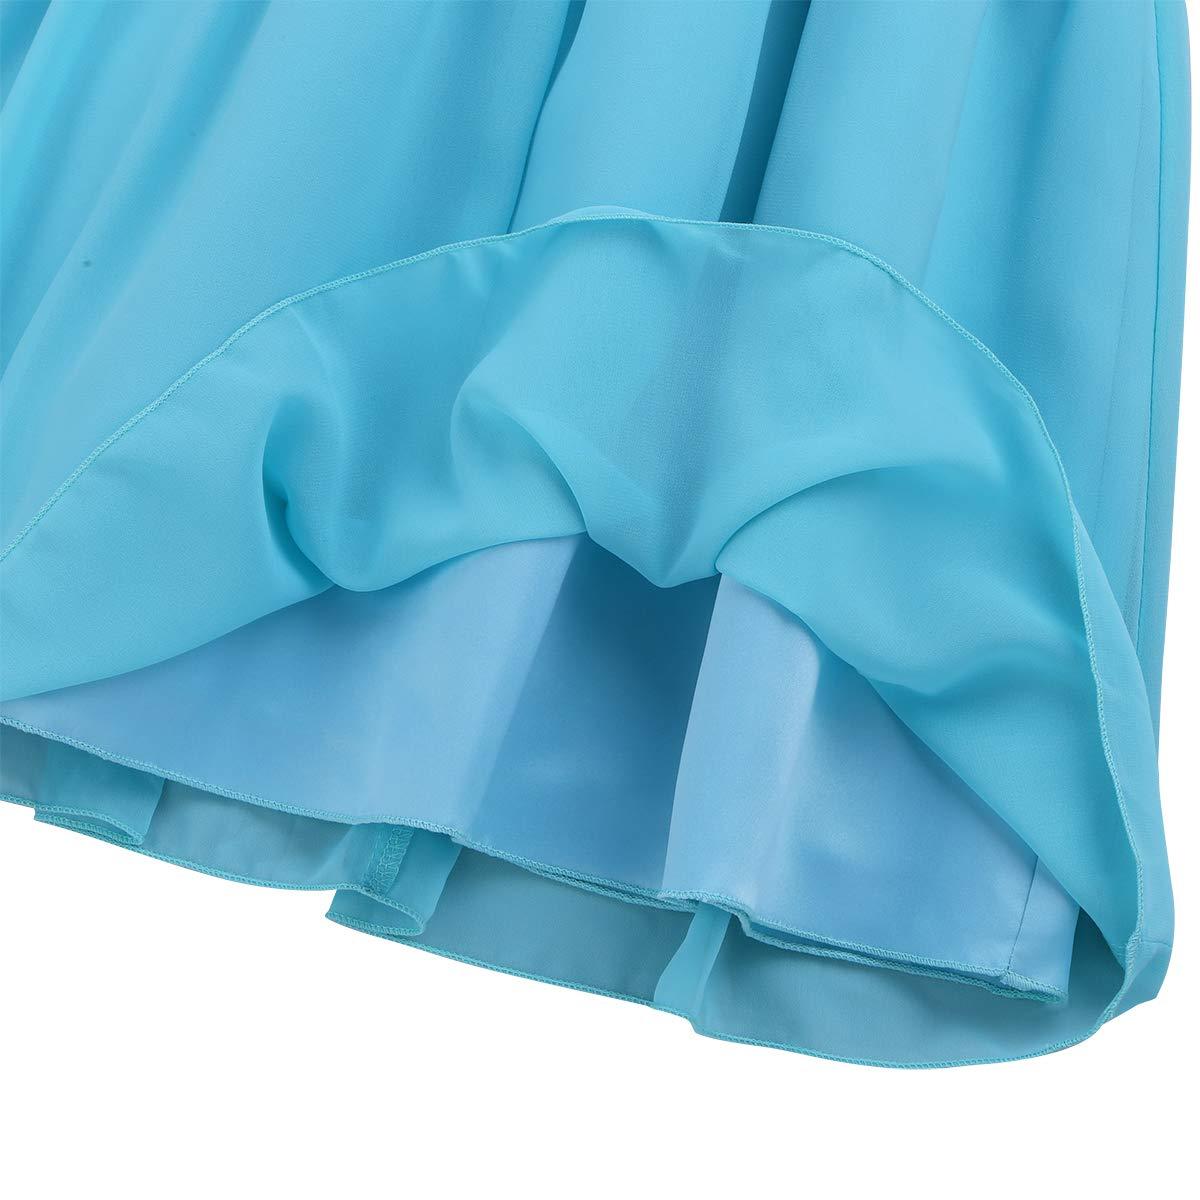 MAMALICIOUS Mlwinnie Linen Skirt Falda Deportiva premam/á para Mujer